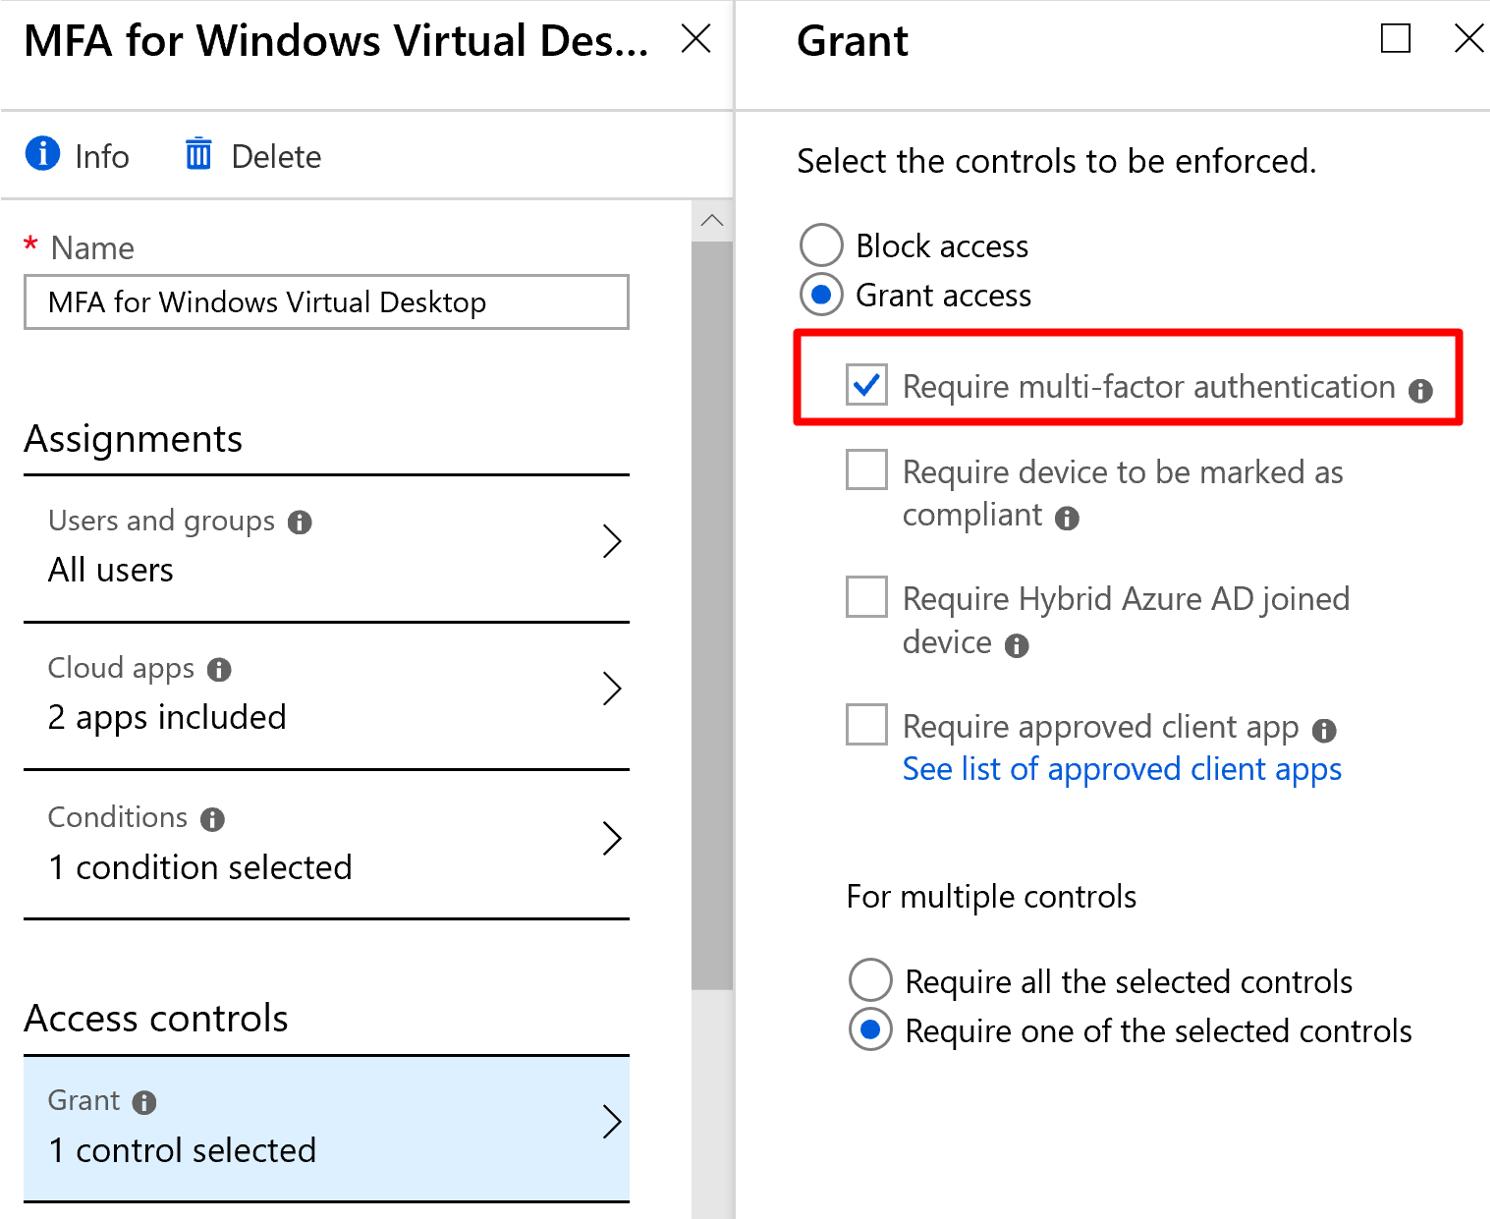 Windows Virtual Desktop with MFA Grant Access Screen